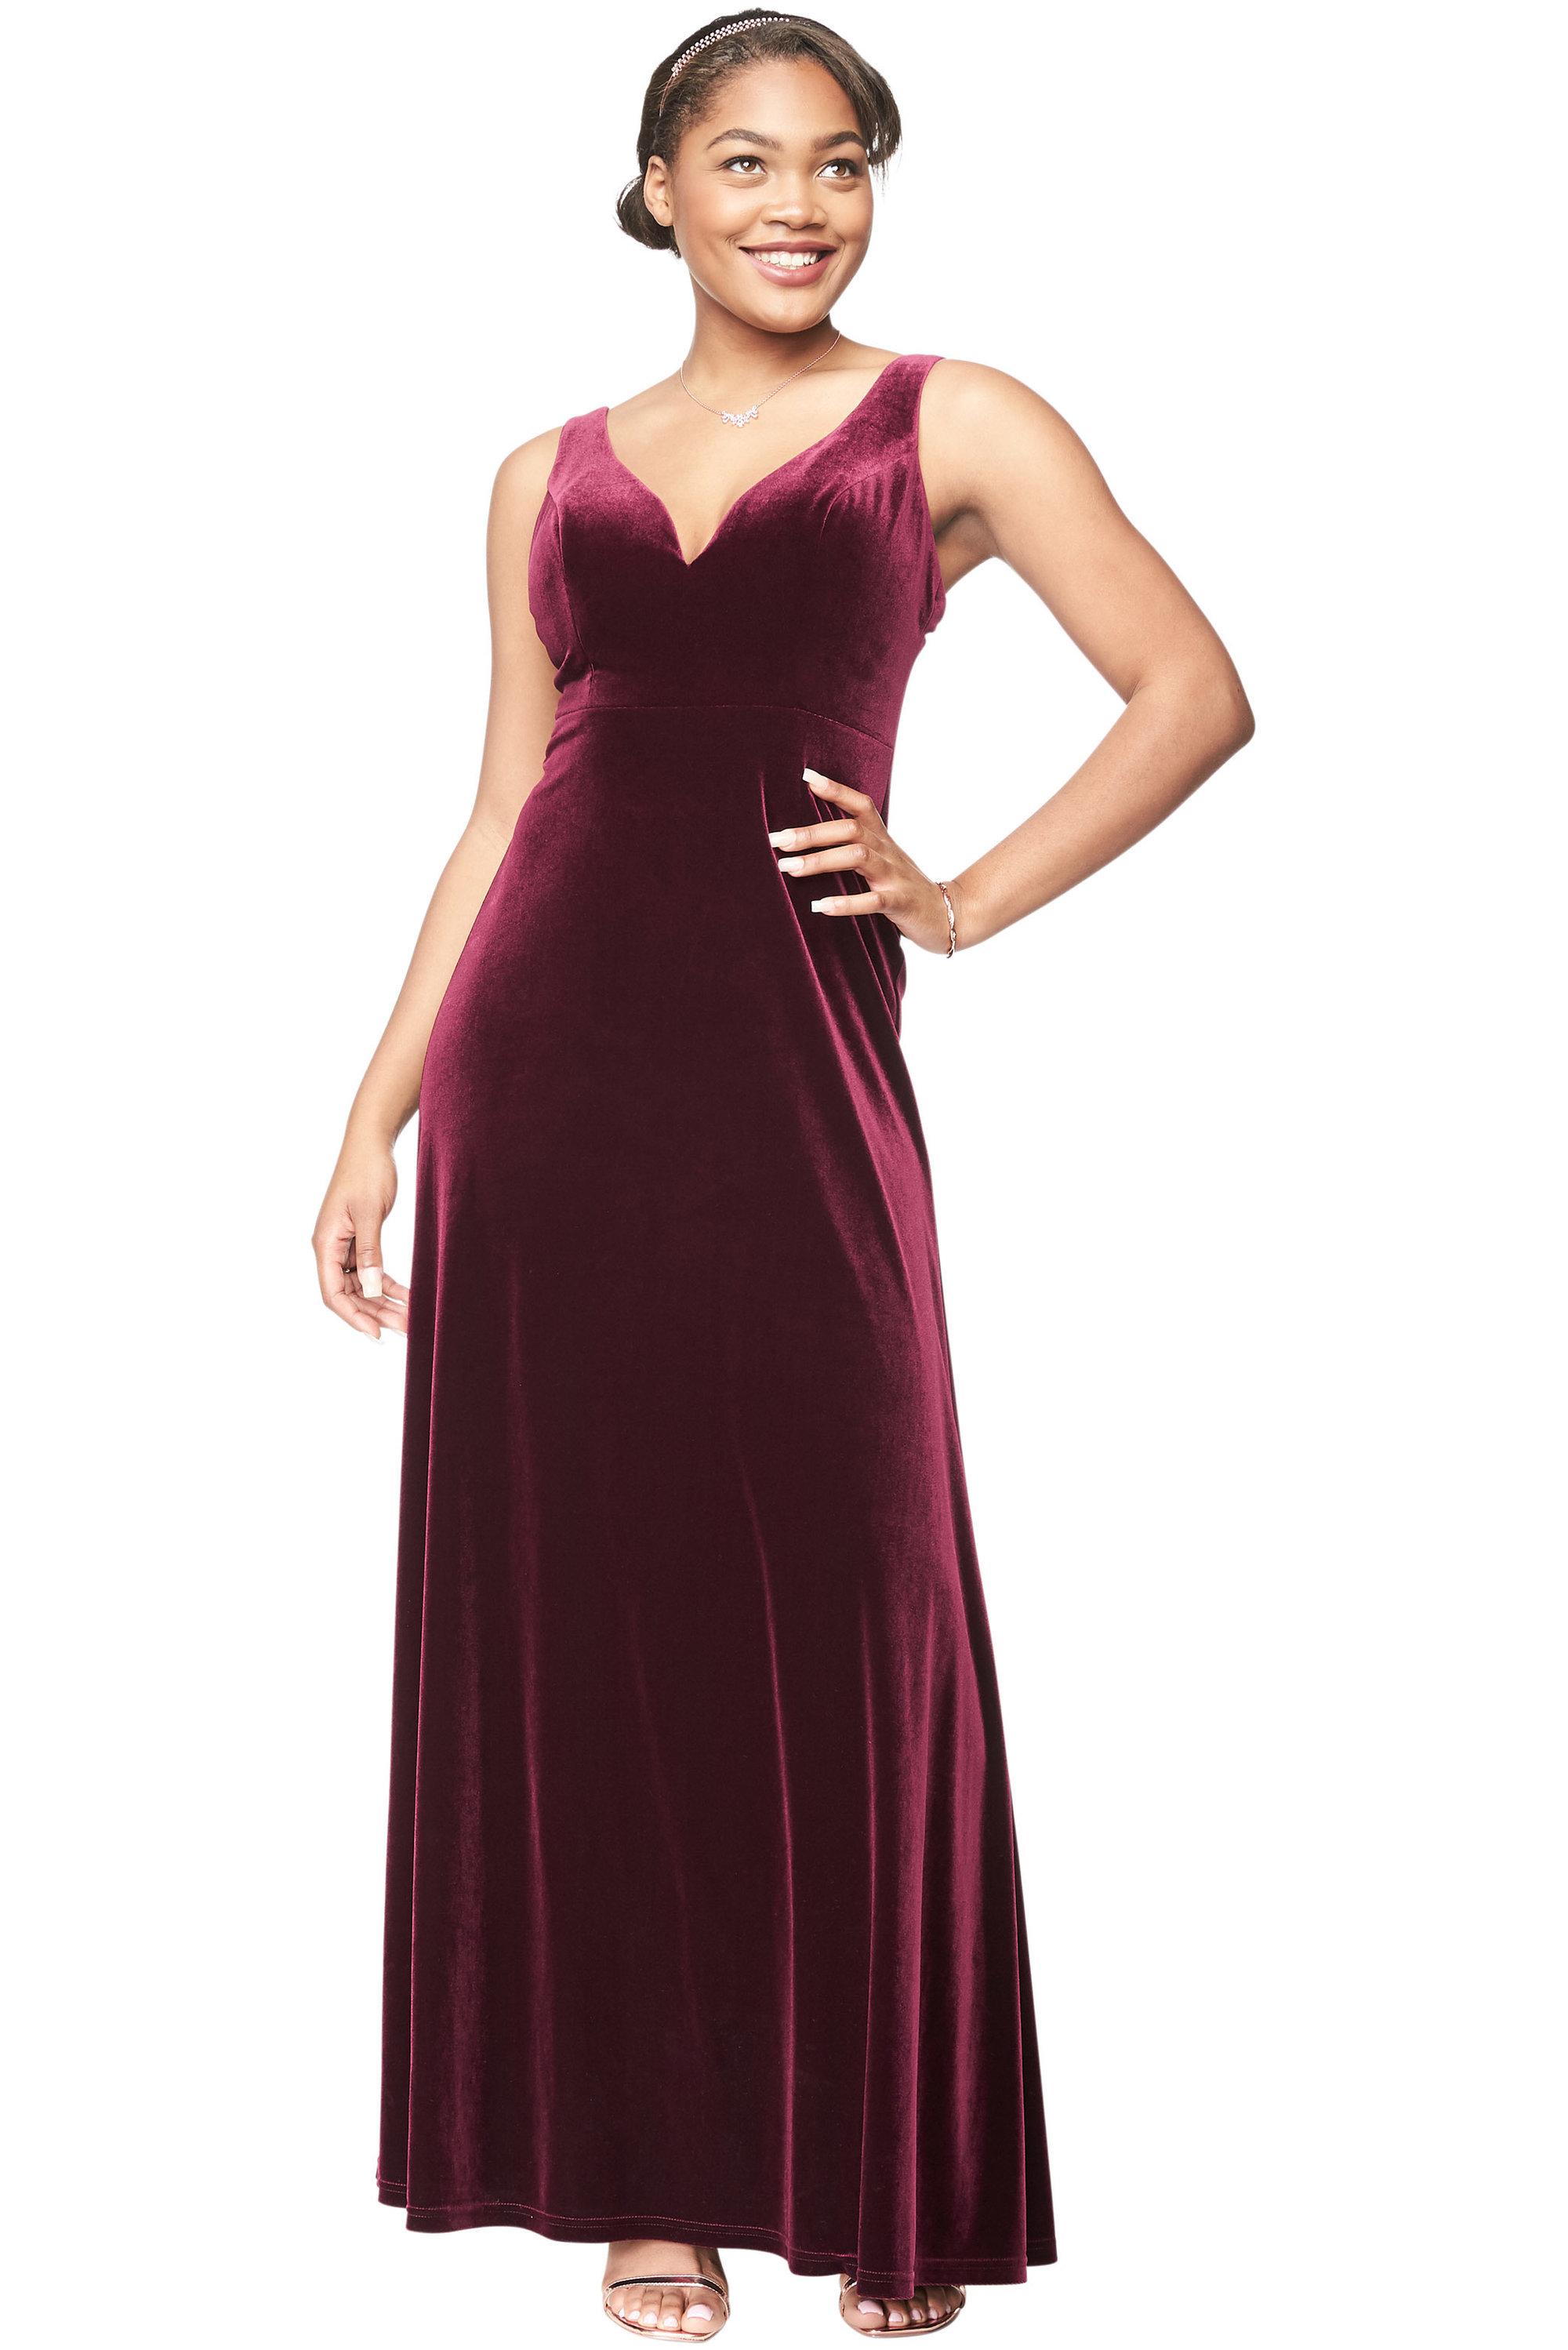 Bill Levkoff WINE Stretch Velvet V-Neck A-Line gown, $230.00 Front